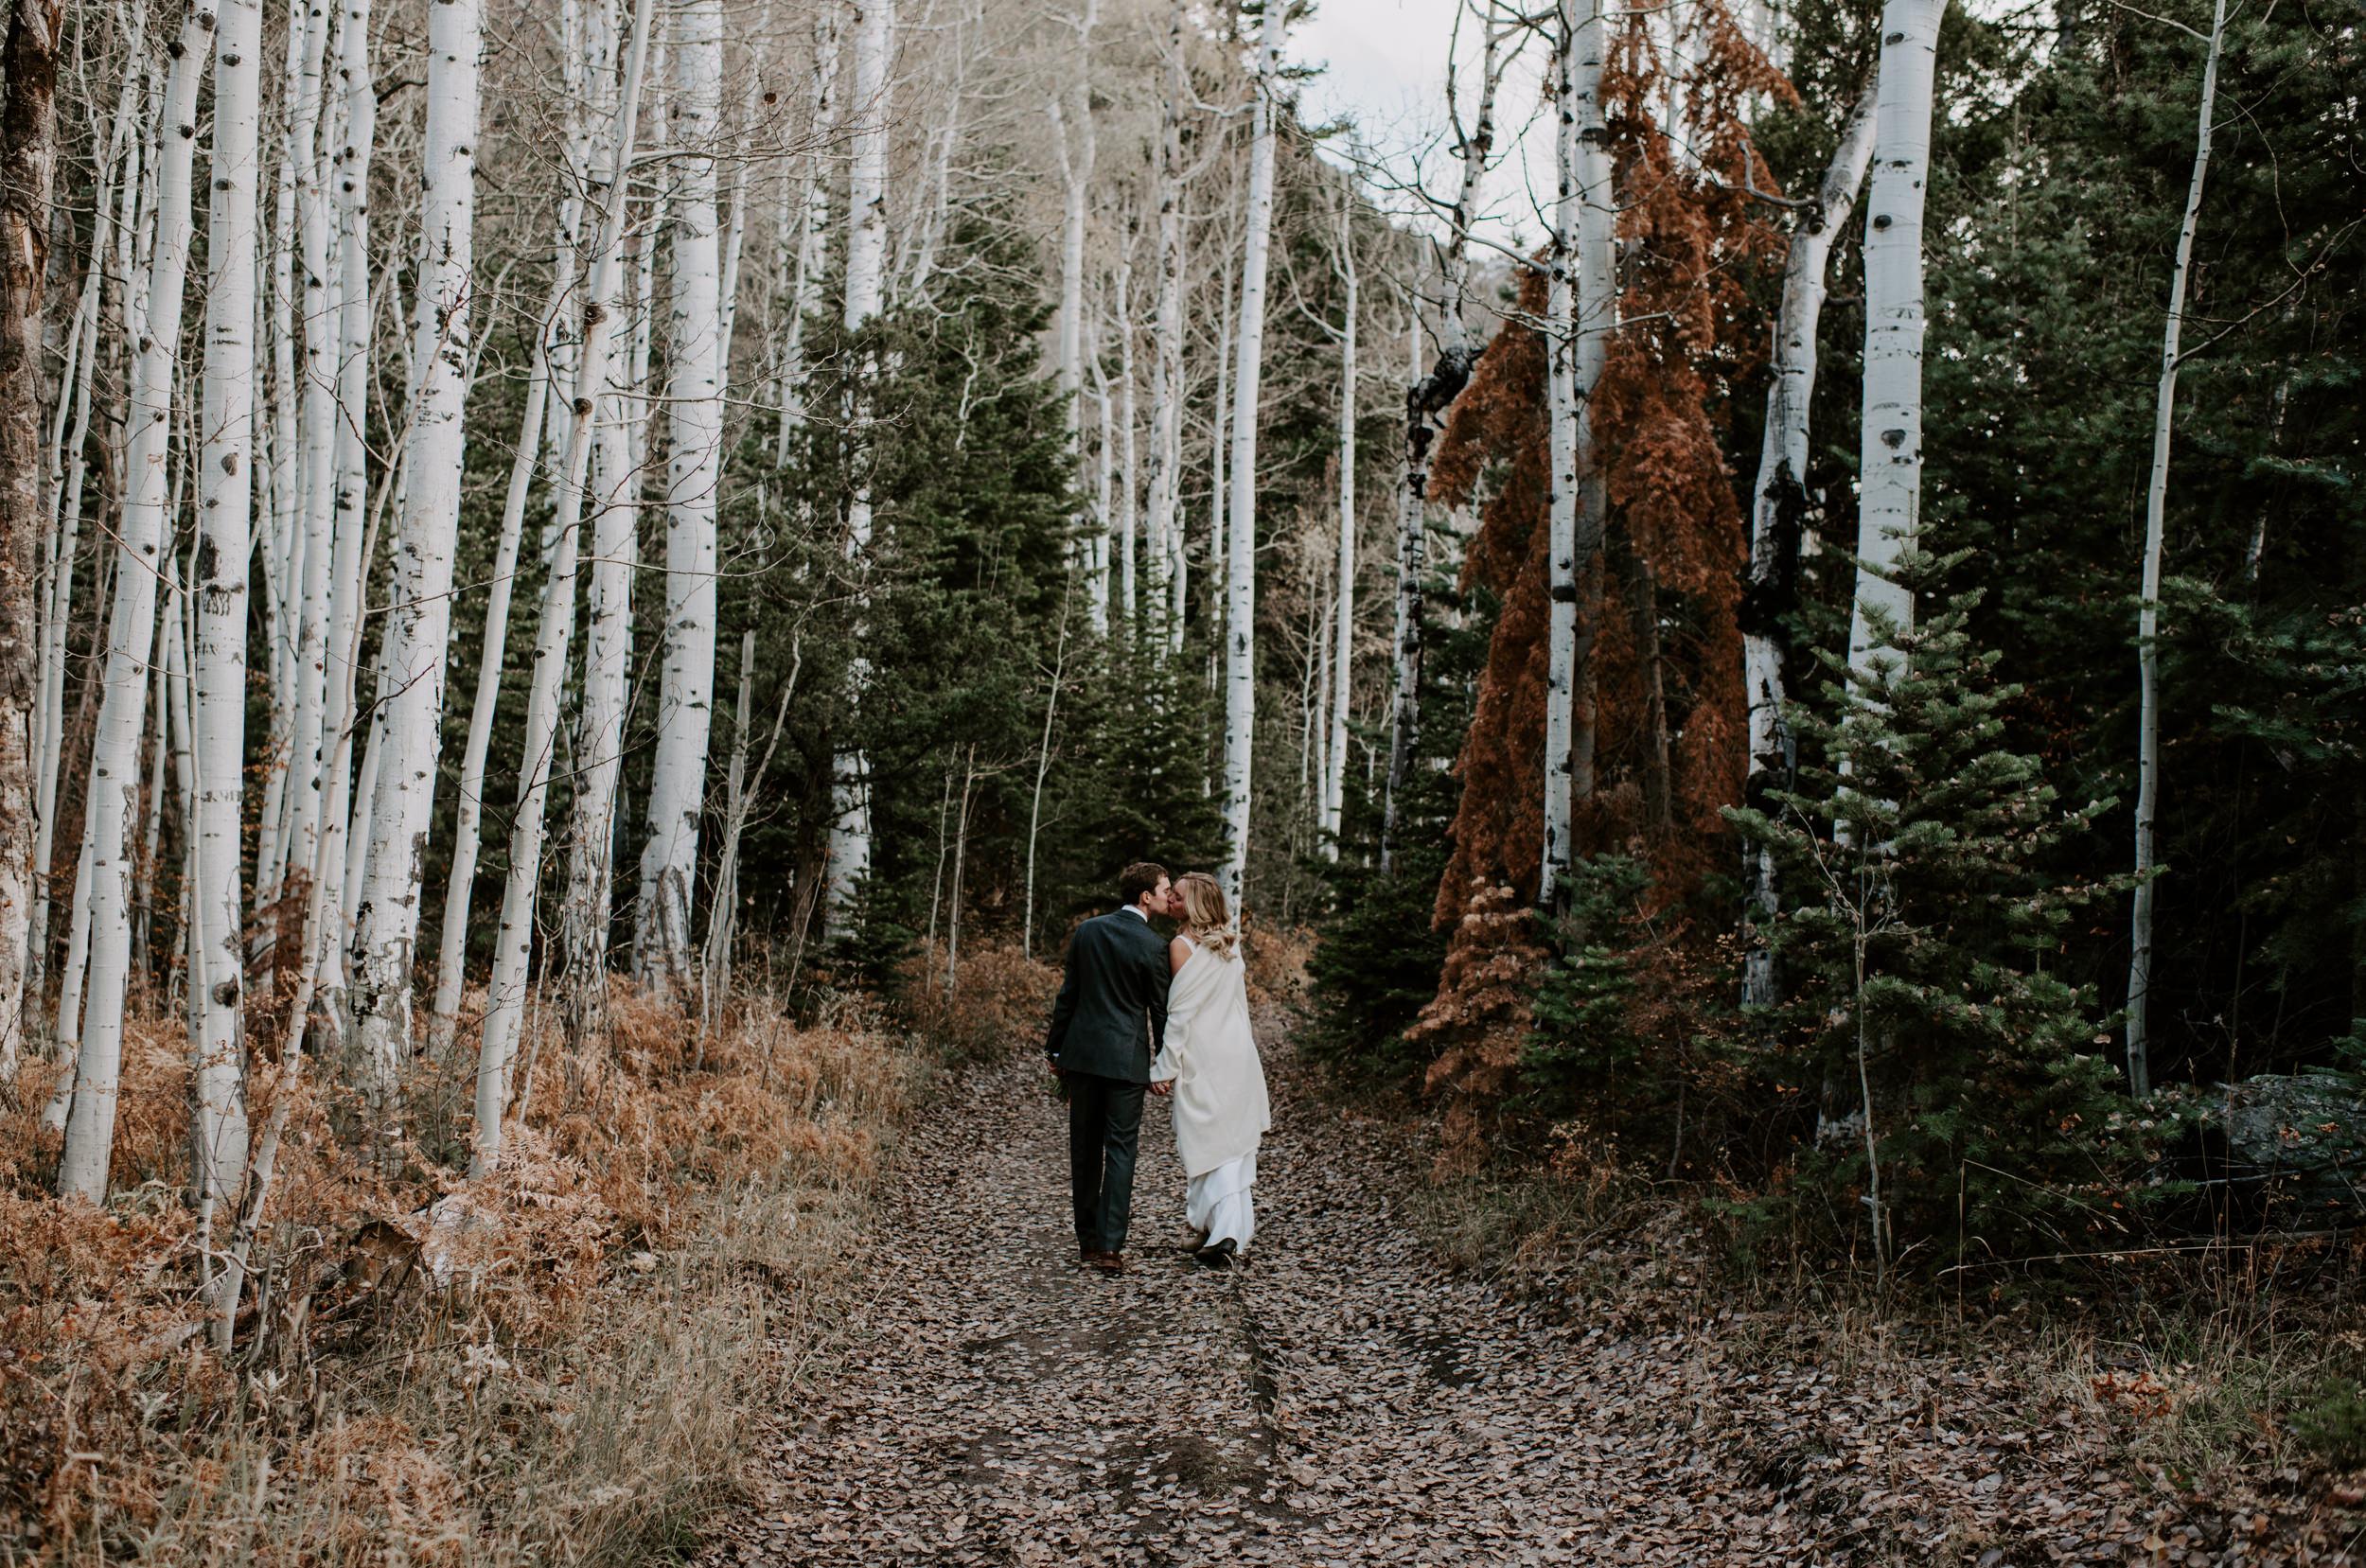 Fall Colorado elopement photos in Ouray, Colorado. Telluride wedding and elopement photographer.